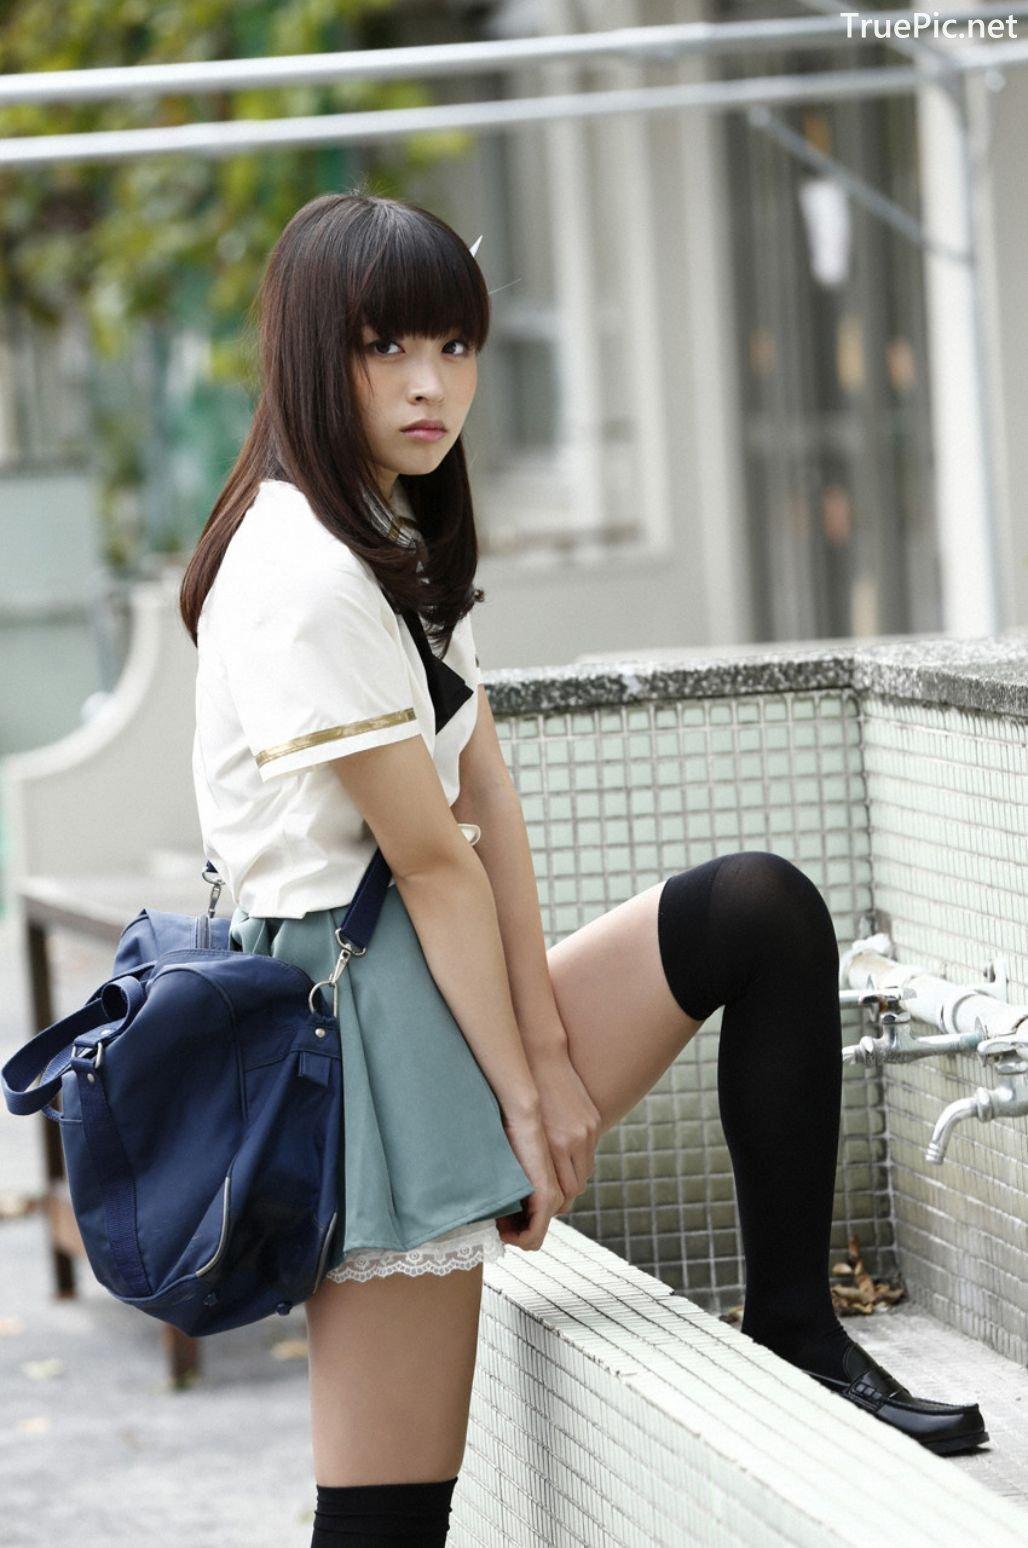 Image-Japanese-Gravure-Idol-Mio-Otani-Photos-Purity-Miss-Magazine-TruePic.net- Picture-8